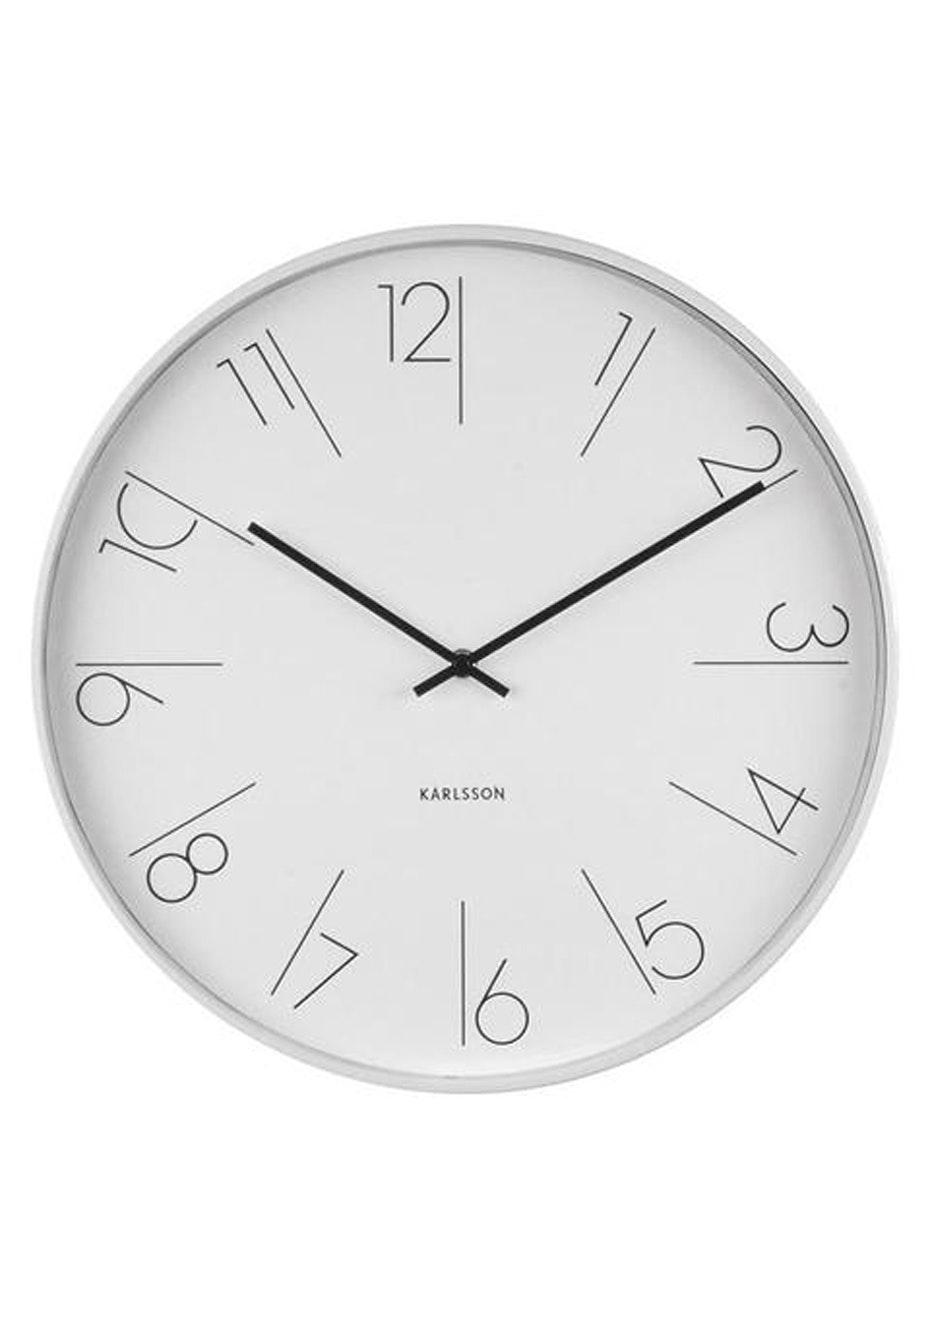 Karlsson - Wall Clock 'Elegant Numbers' - White